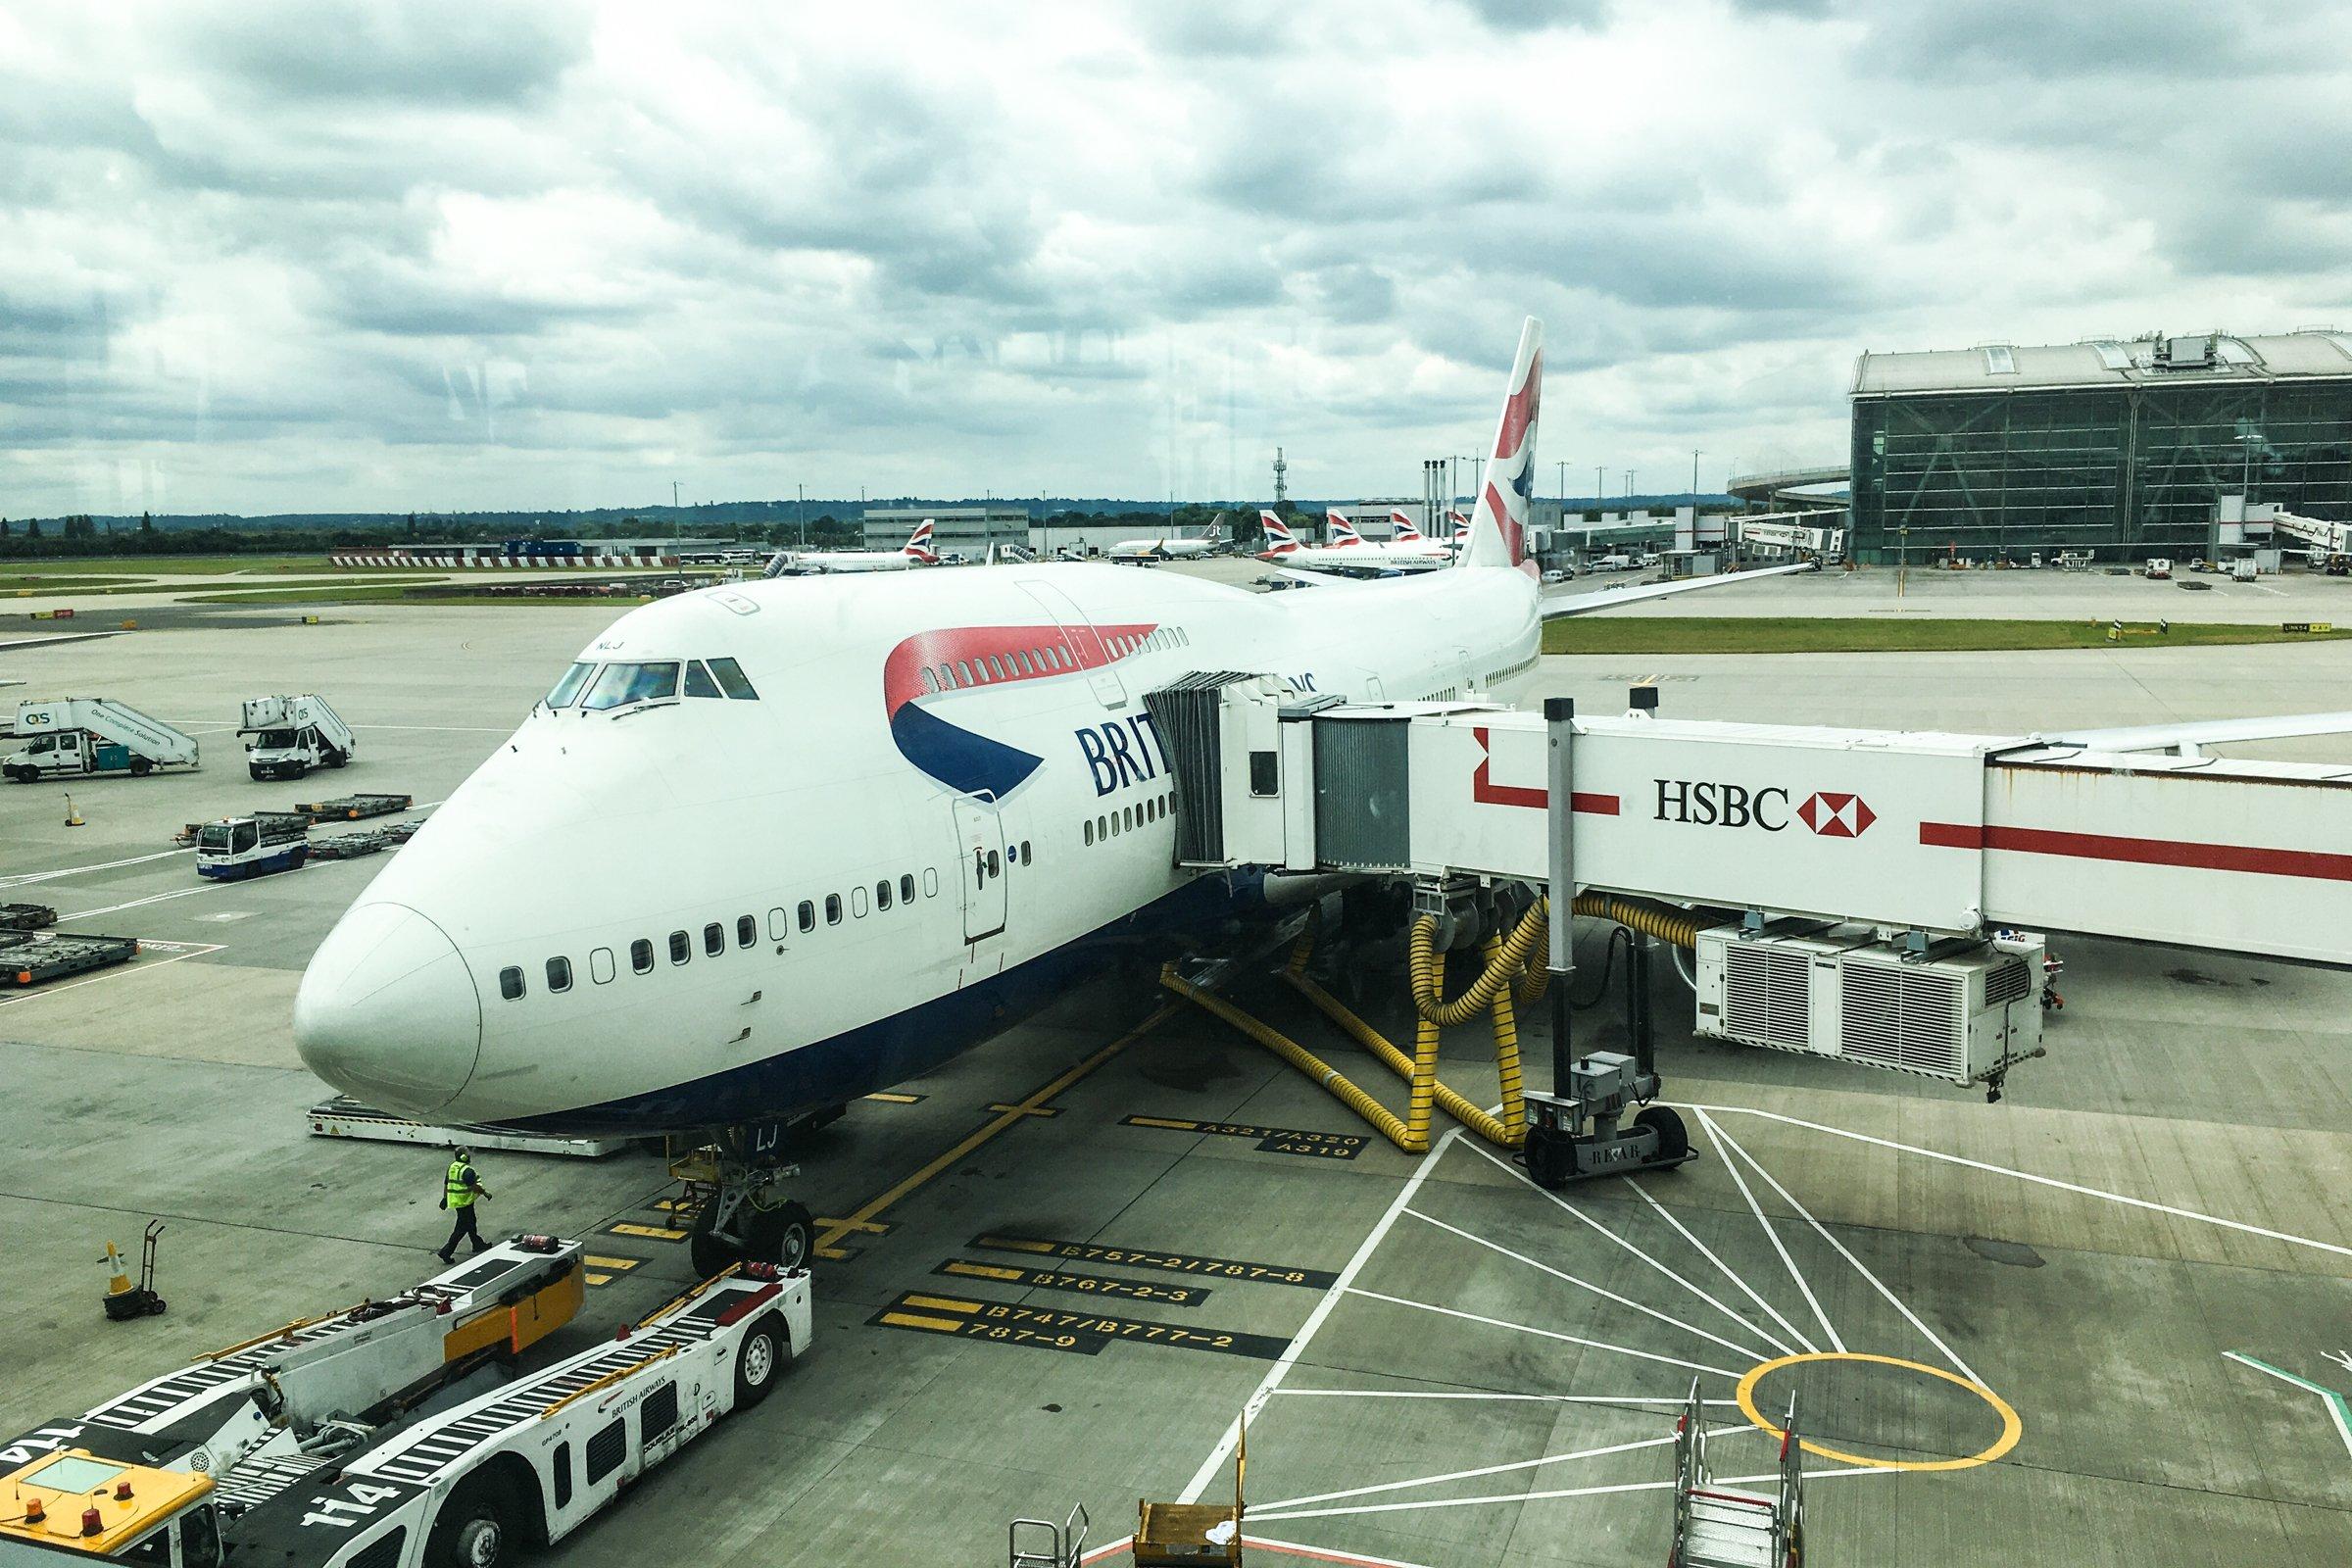 Jumbo Airplane at Airport Terminal